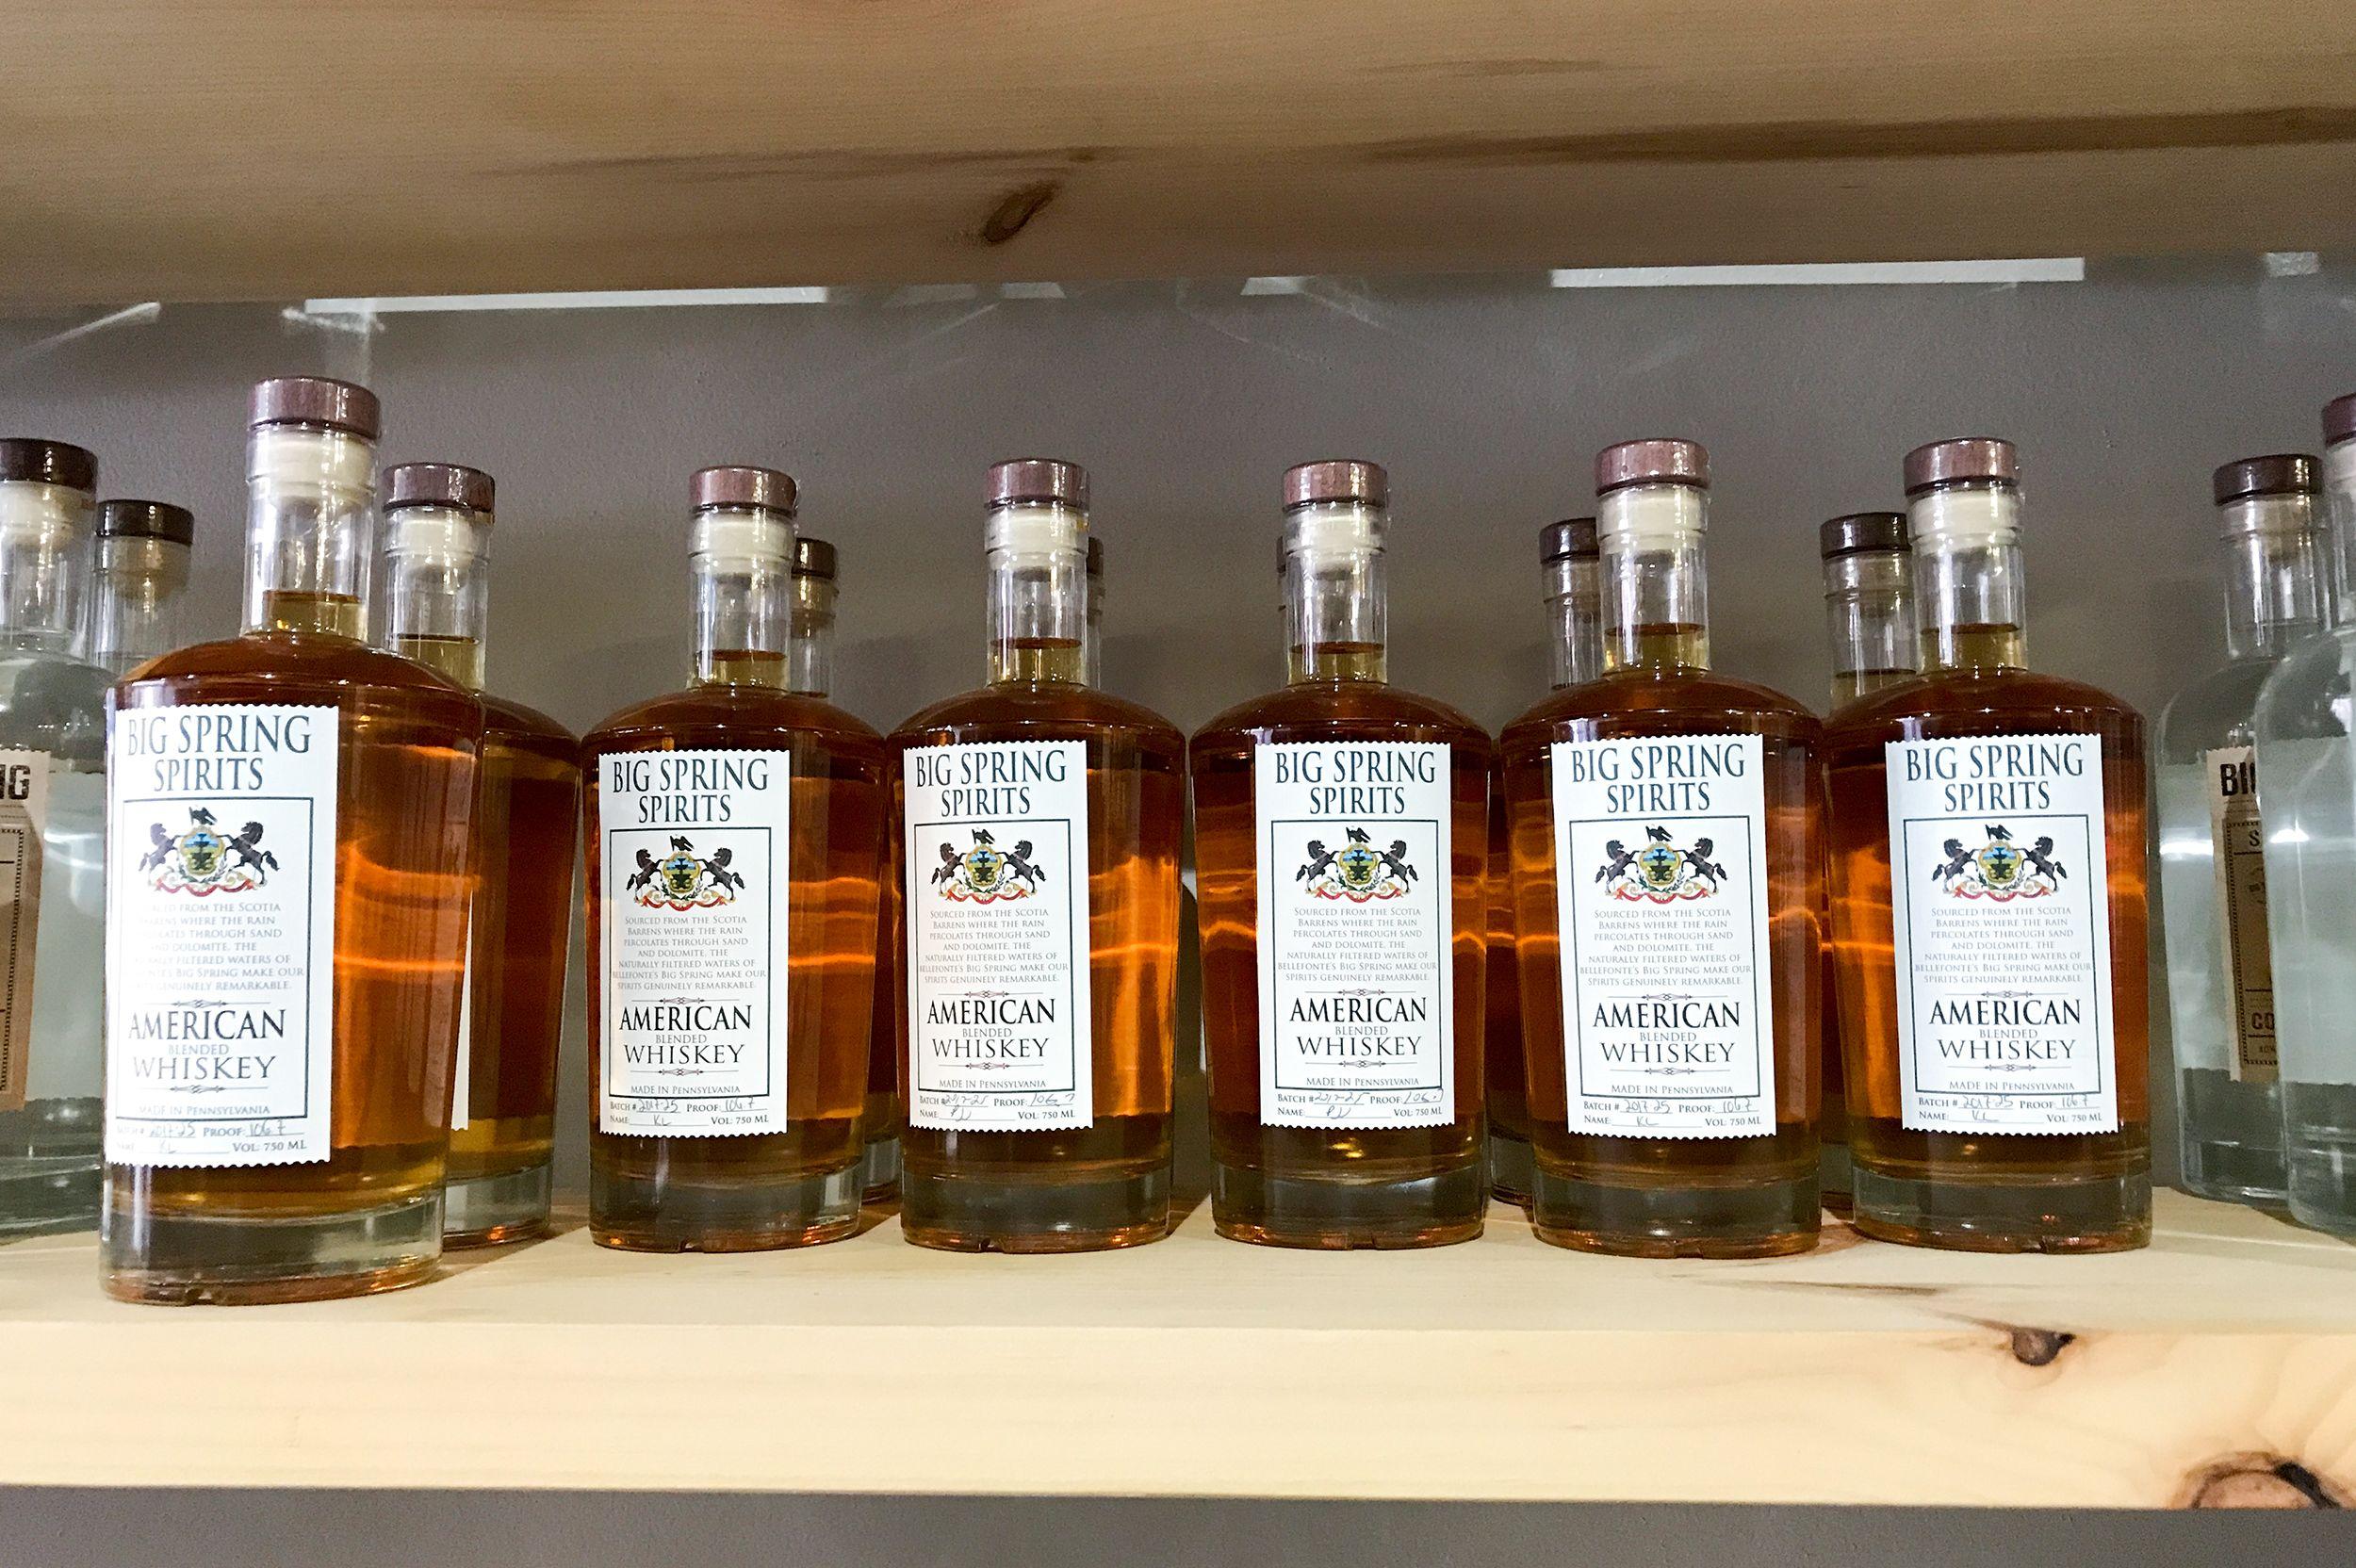 Ein Regal mit Whisky im Pennsylvania Libations Shop in Pittsburgh